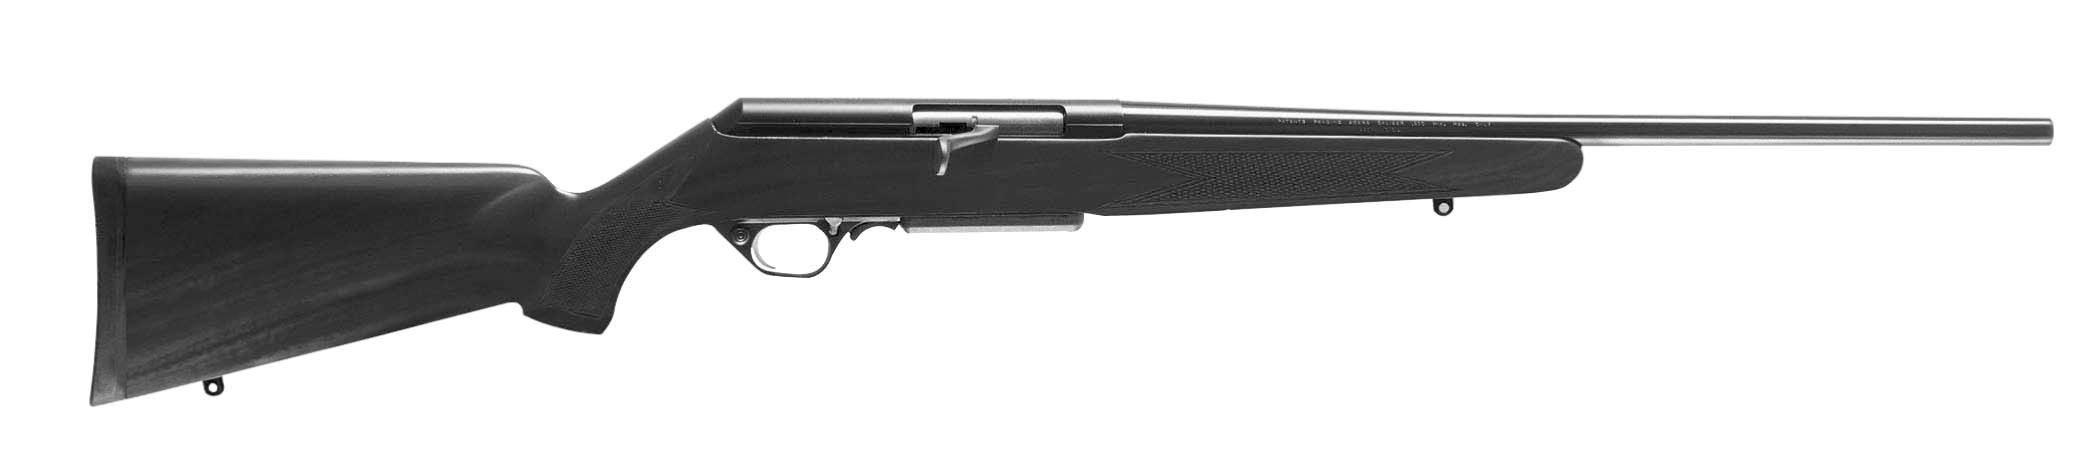 Acera Straight Pull Rifle